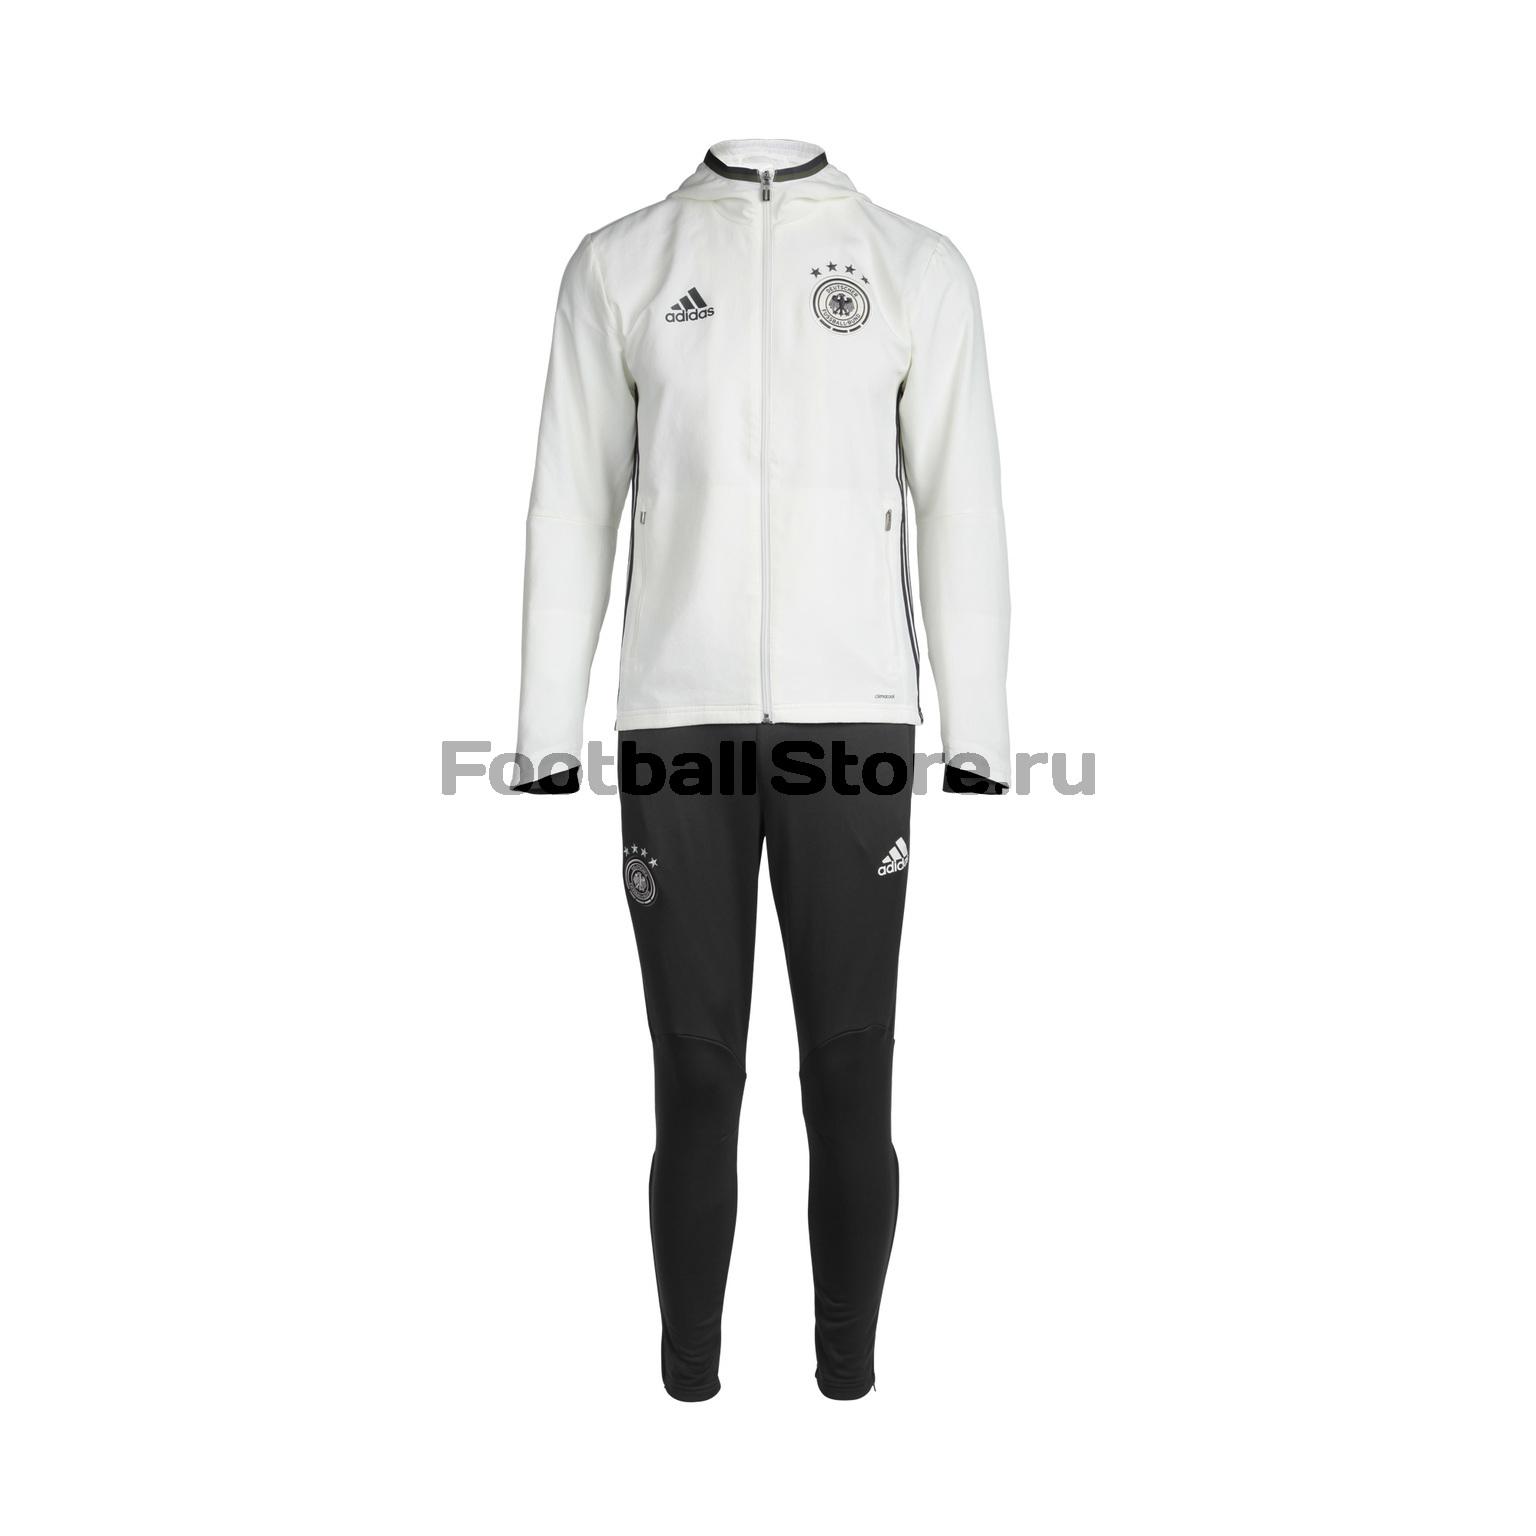 85bcdc4415d6 ... Germany · Adidas  Костюм спортивный Adidas сборной Германии Pre AC6523.  Скидка